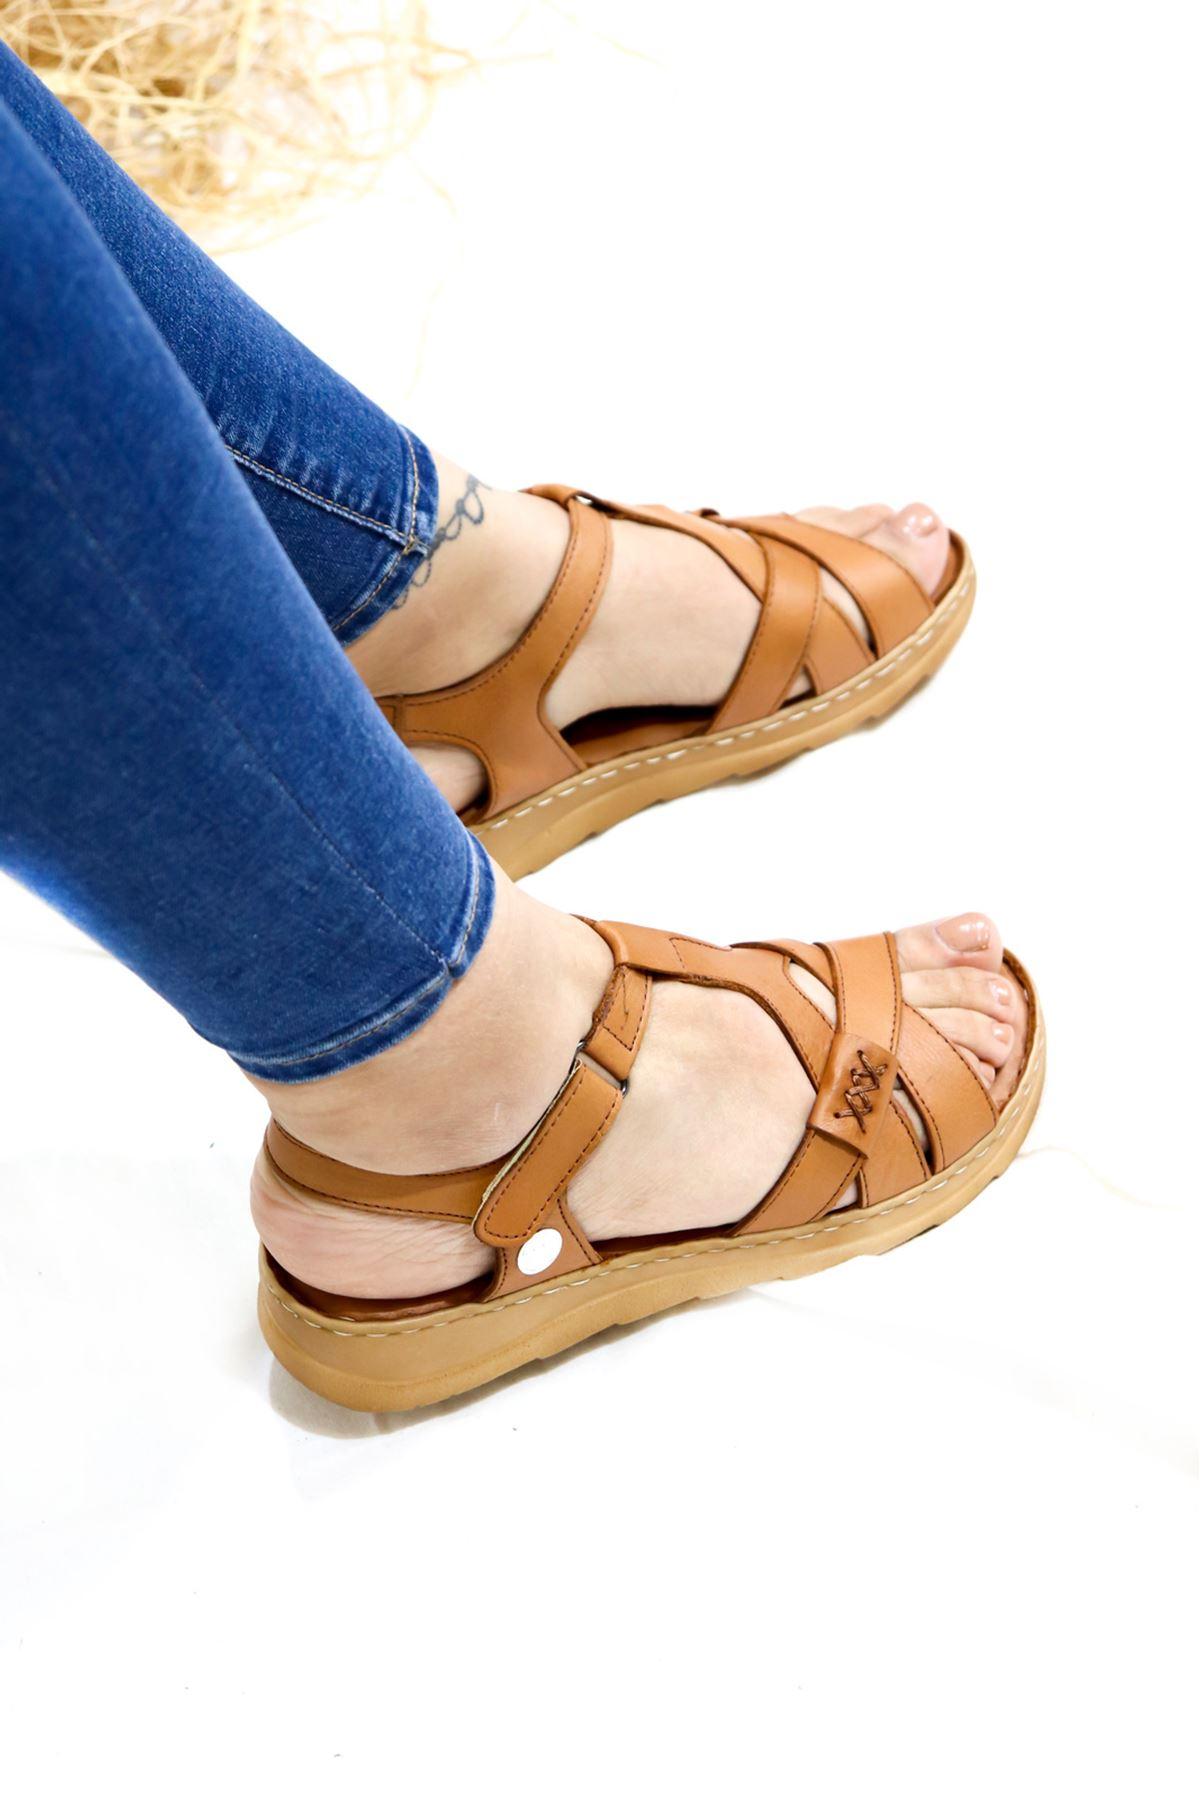 Mammamia - D21YS -1145-B Taba Kadın Sandalet